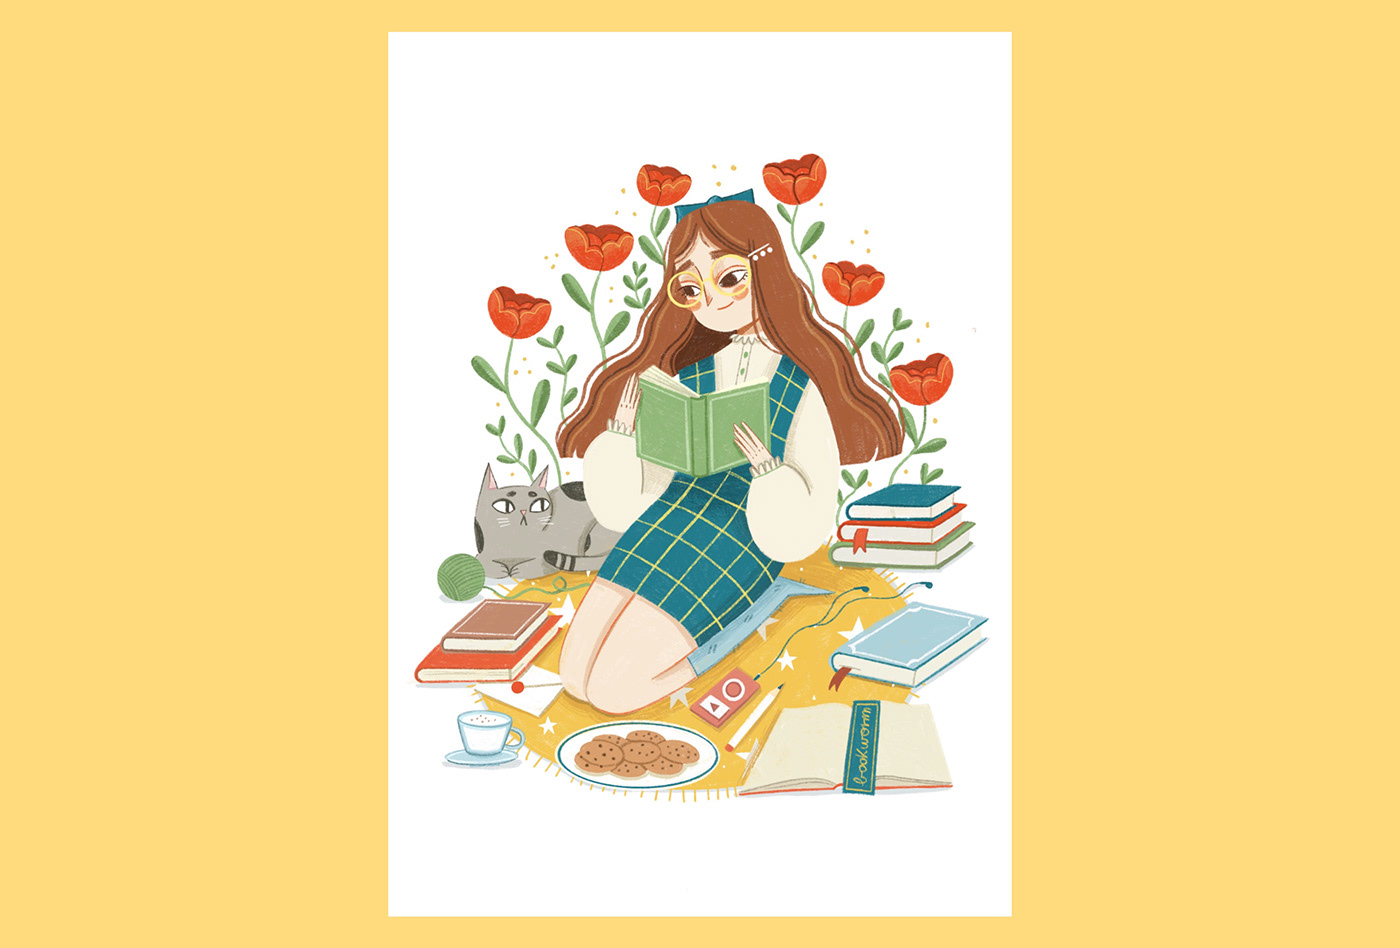 art Bookworm Character design  digital illustration ILLUSTRATION